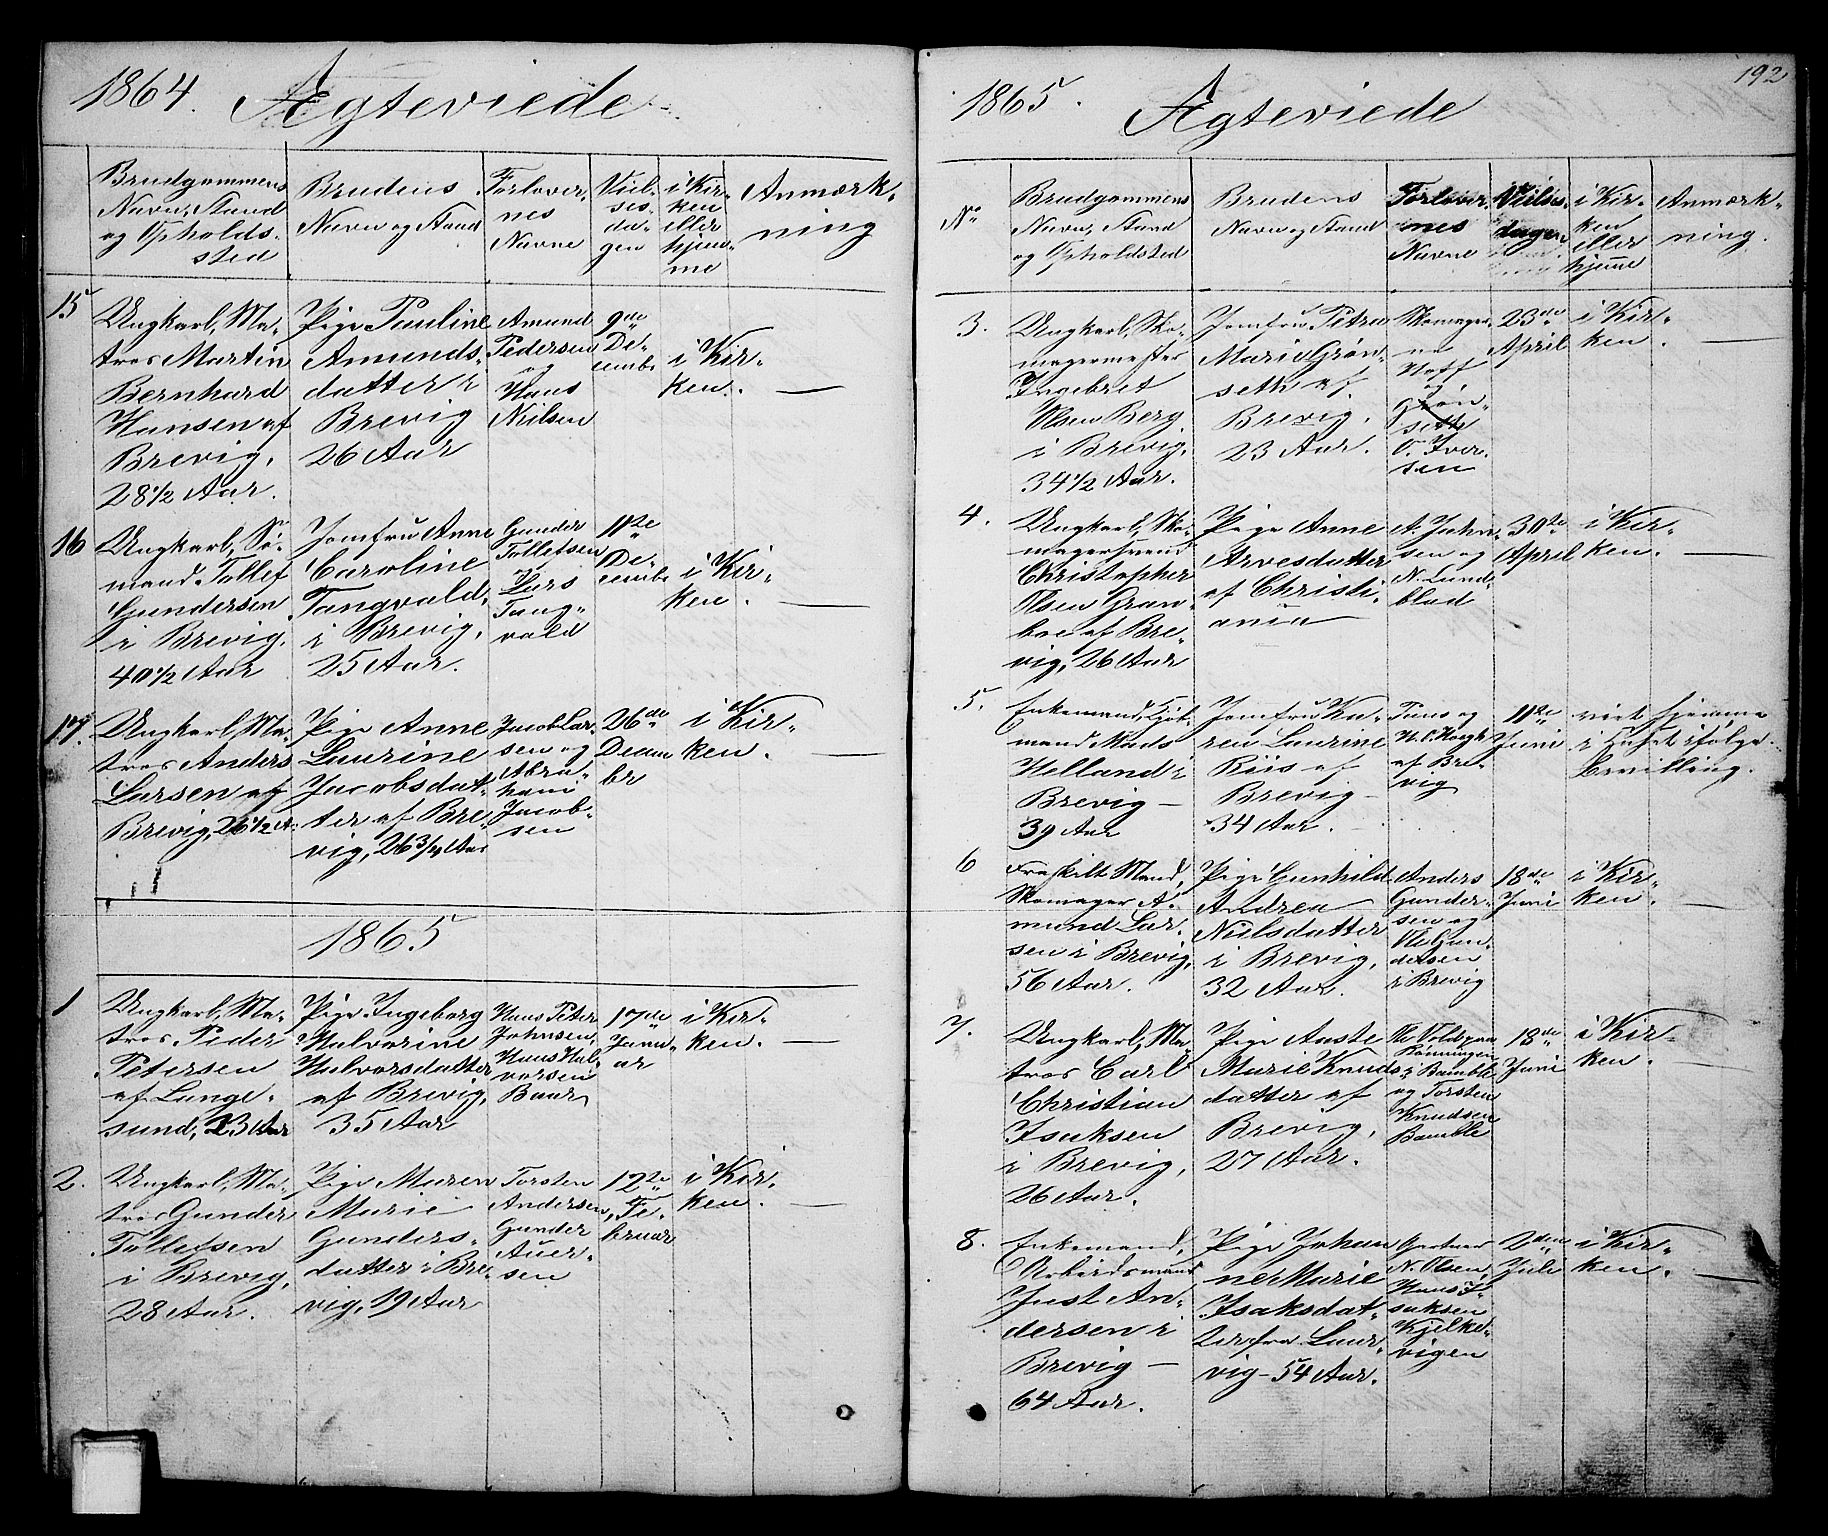 SAKO, Brevik kirkebøker, G/Ga/L0002: Klokkerbok nr. 2, 1846-1865, s. 192